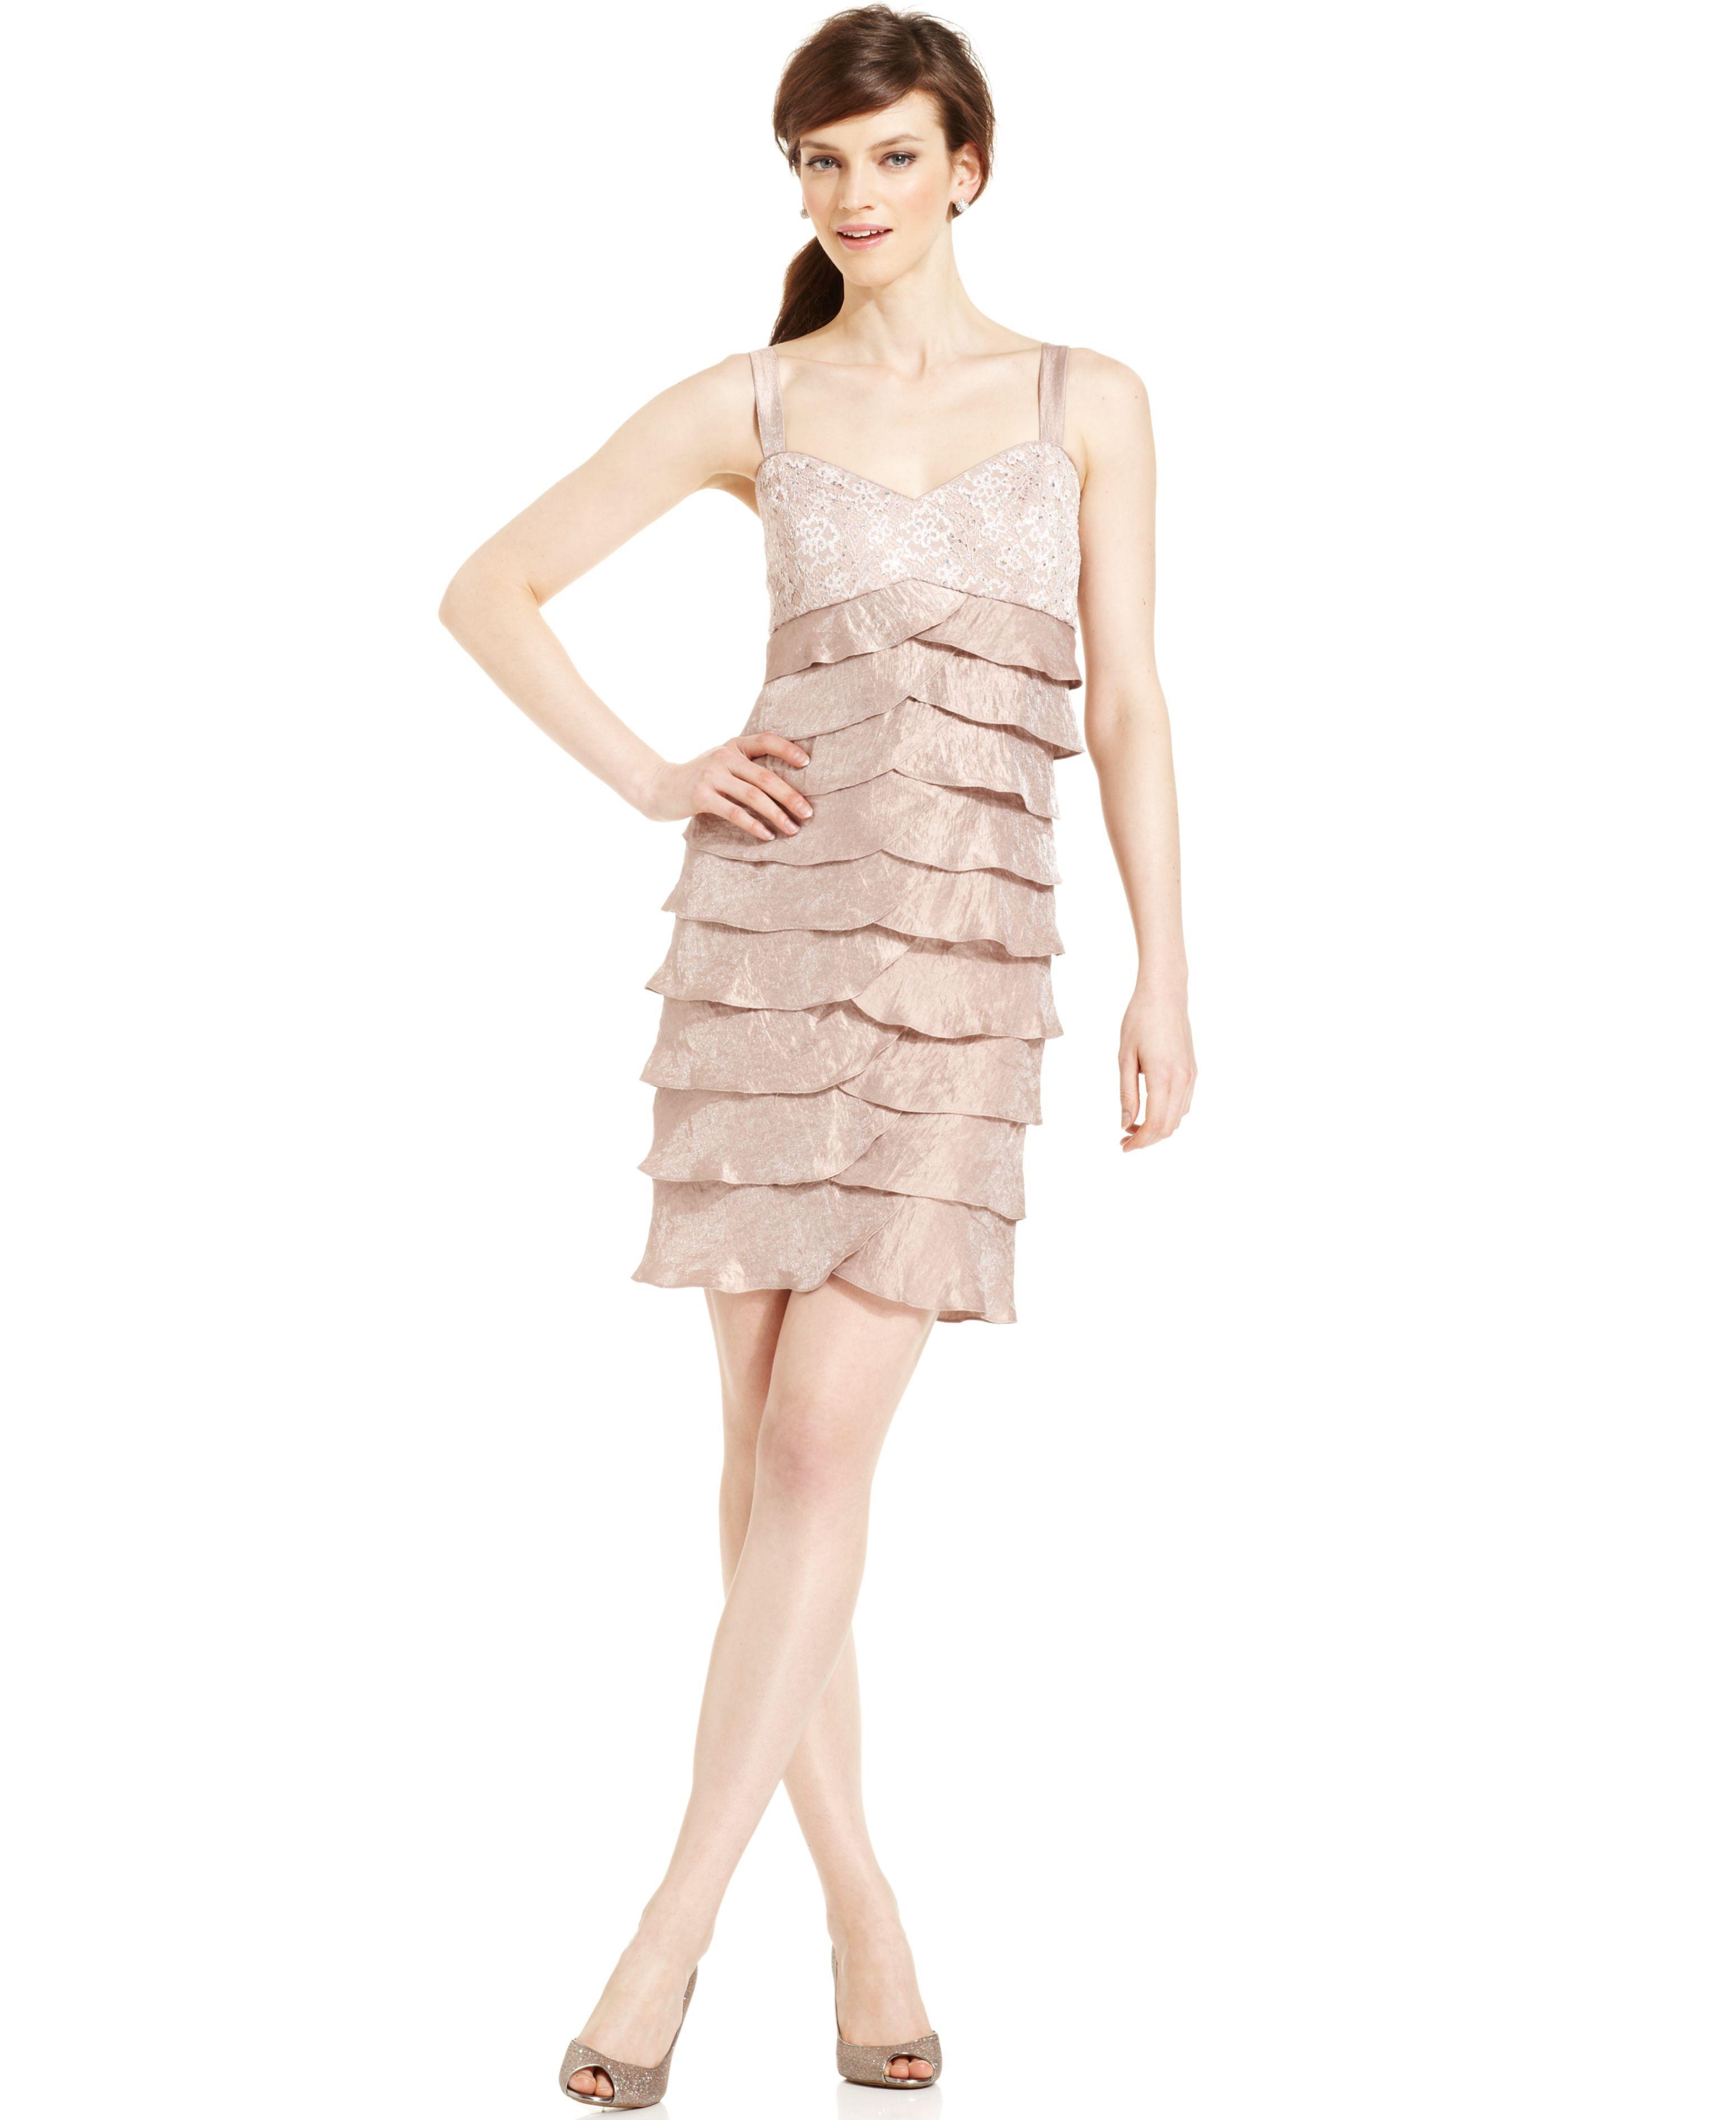 0b3e4aeeaac12 MACYS ---- dress ---- Marla Boehr ---- 1431724_fpx ---- | Marla ...